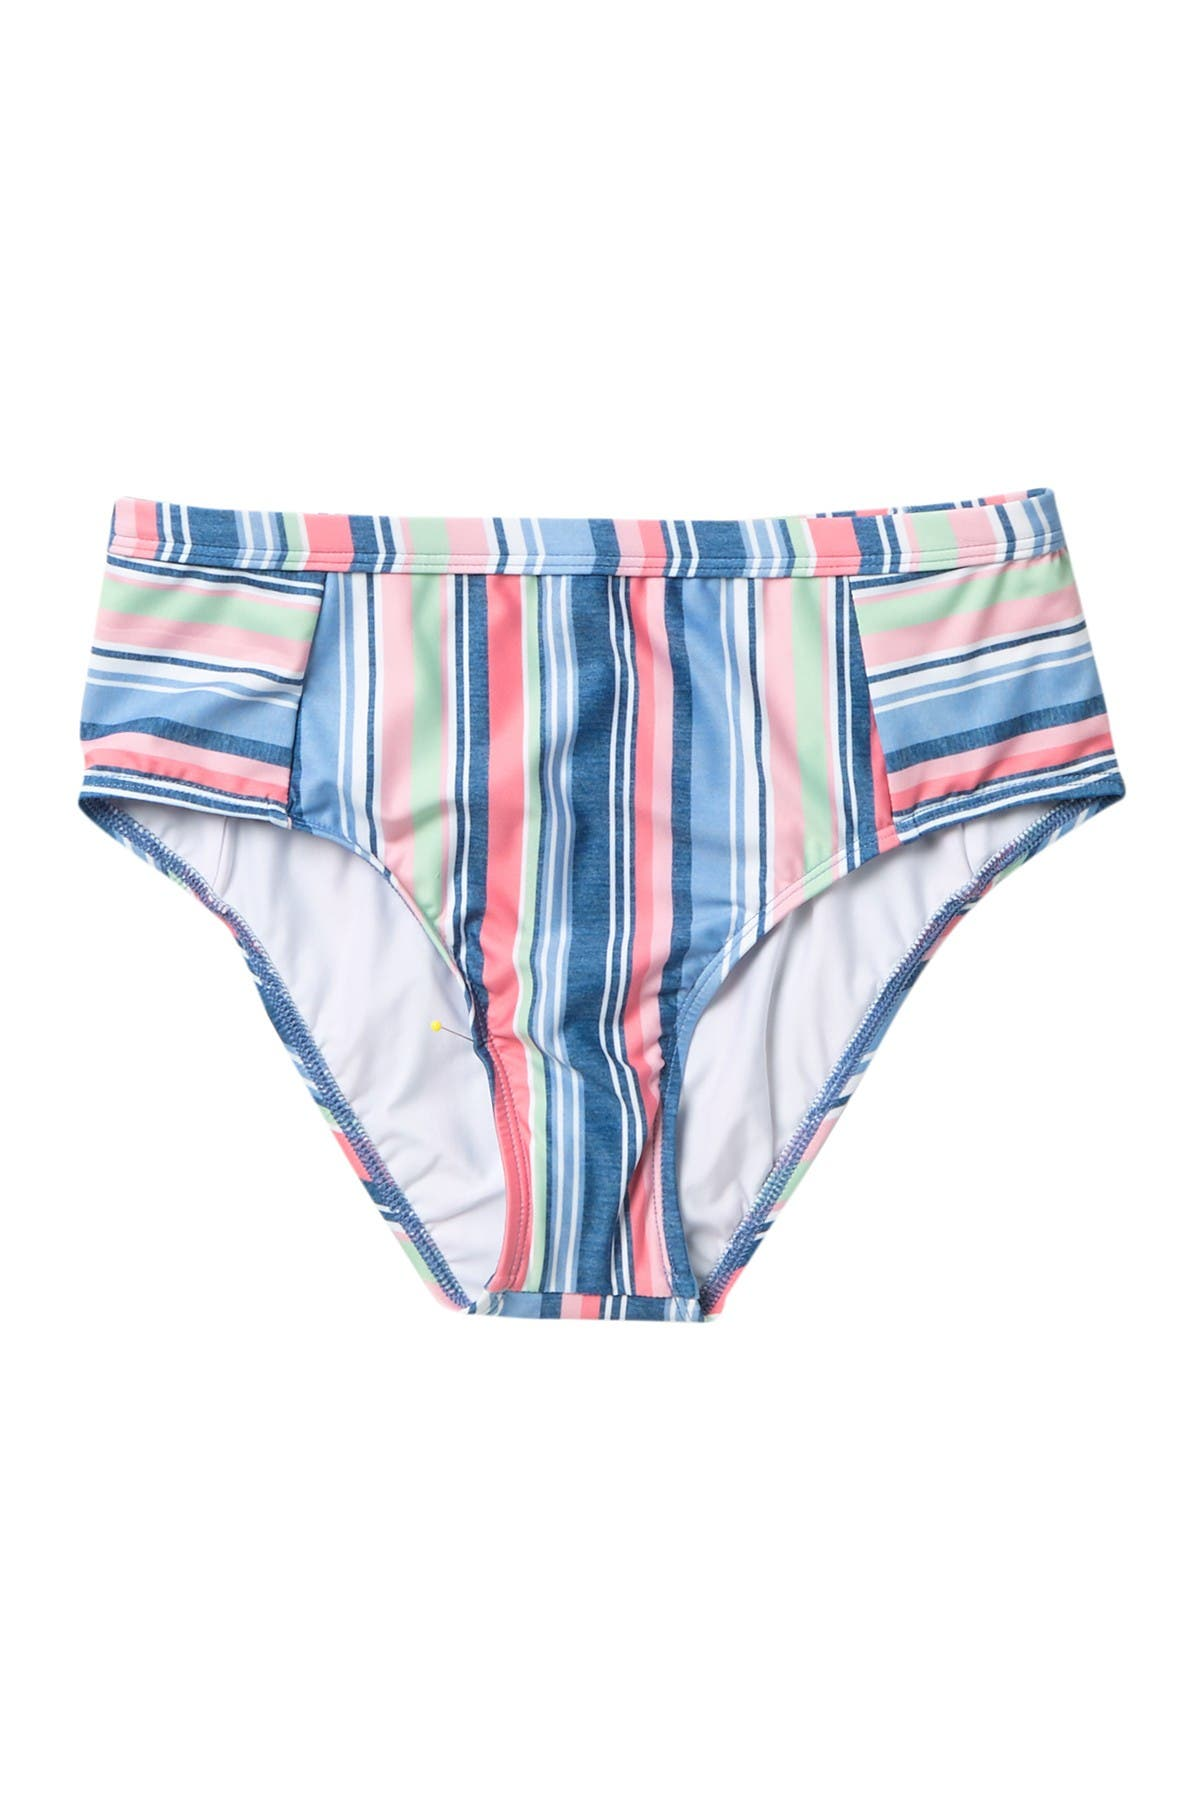 Image of Splendid Holding Pattern High Waisted Bikini Bottoms